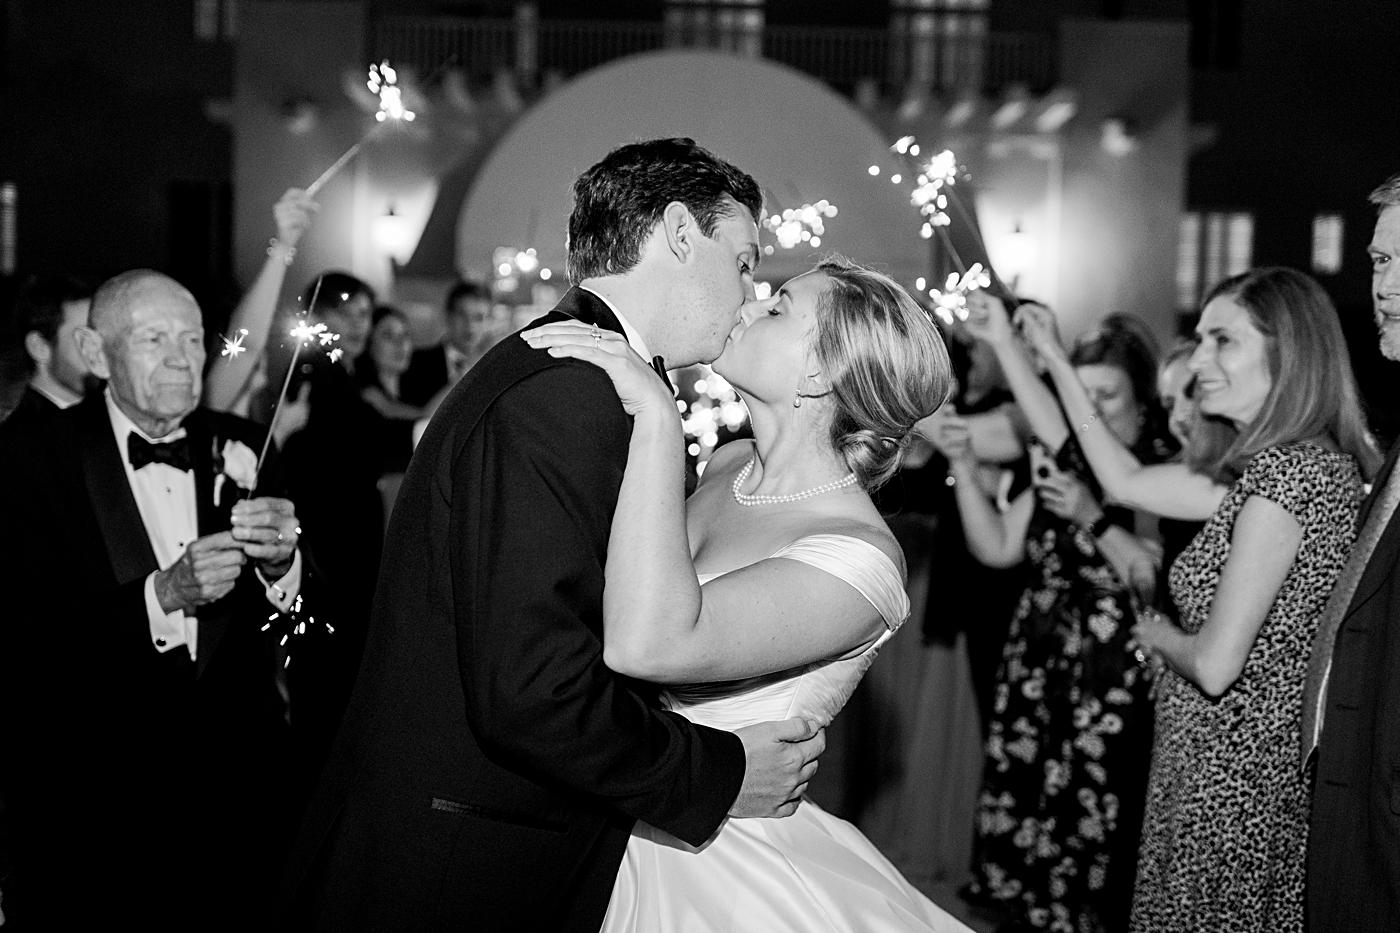 wedding exit photo ideas